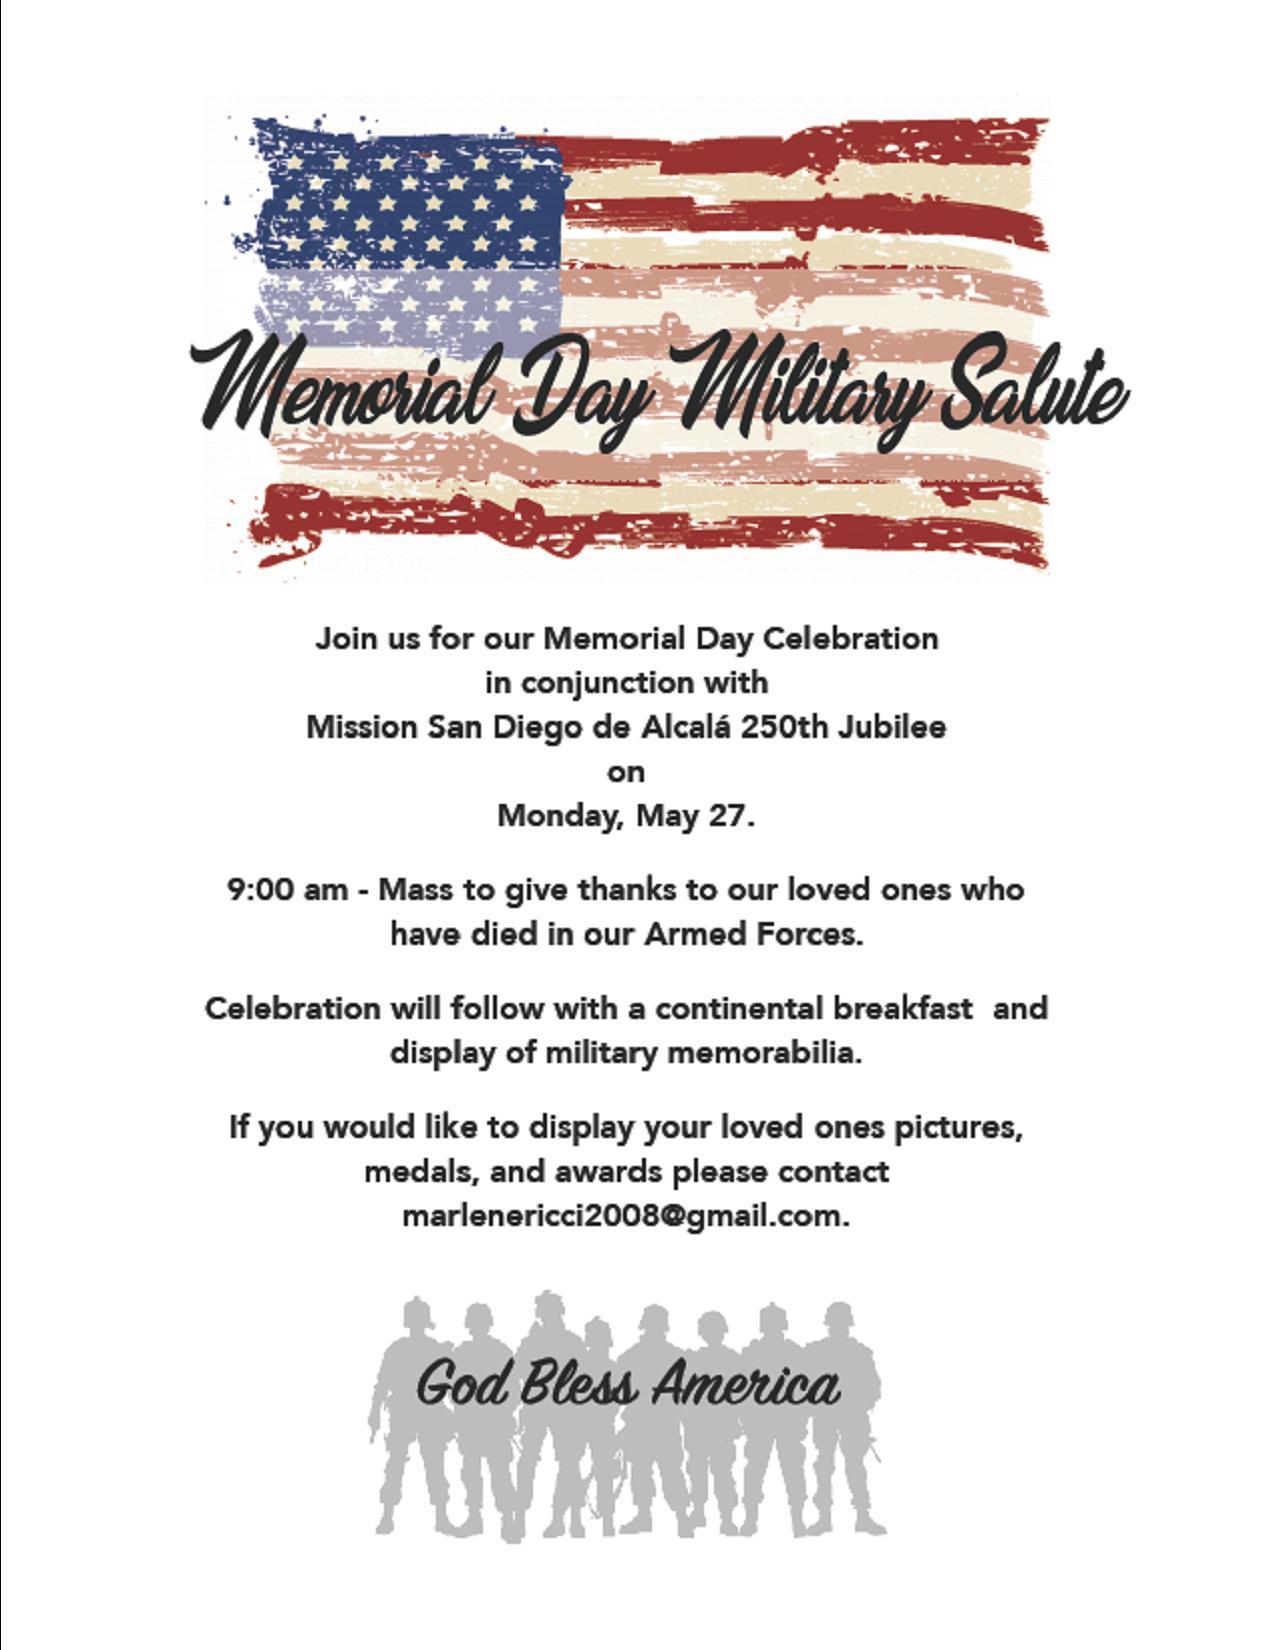 250th Jubilee Memorial Day Military Salute